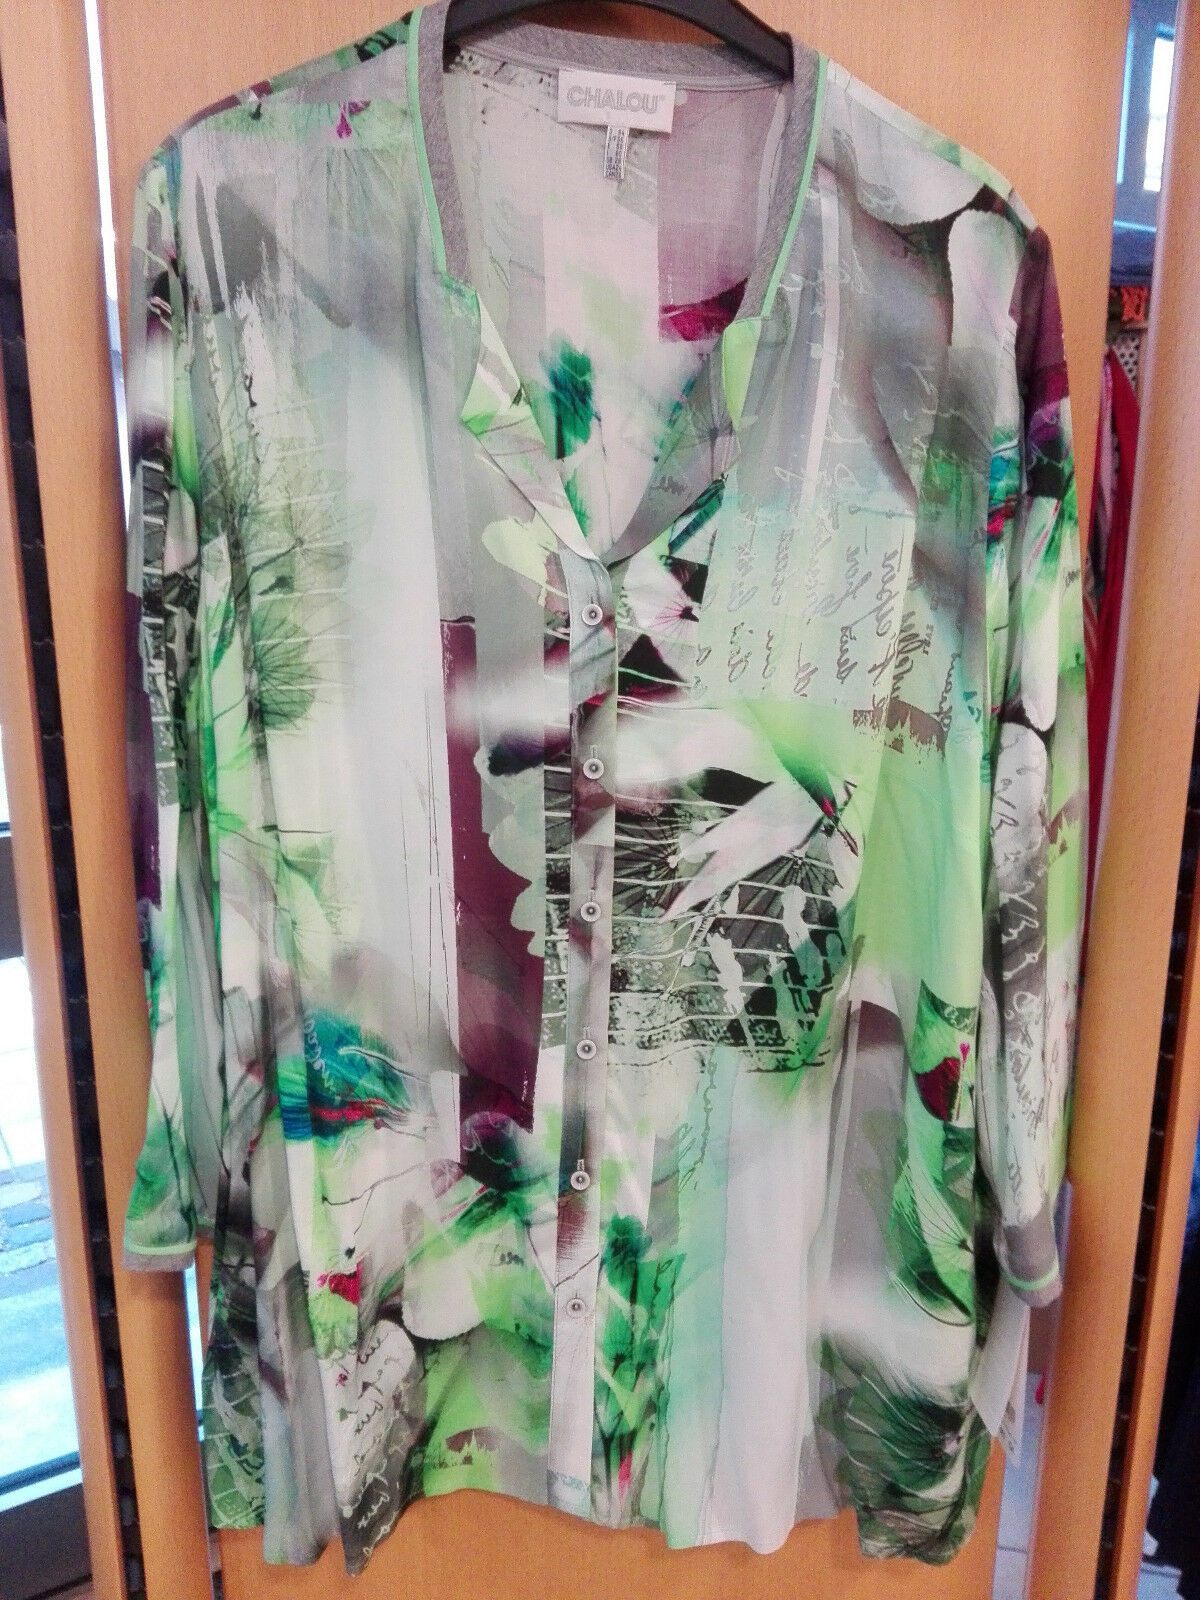 Chalou Damen Blause extravagant lg Arm grün grau Gr. 54 große Größen